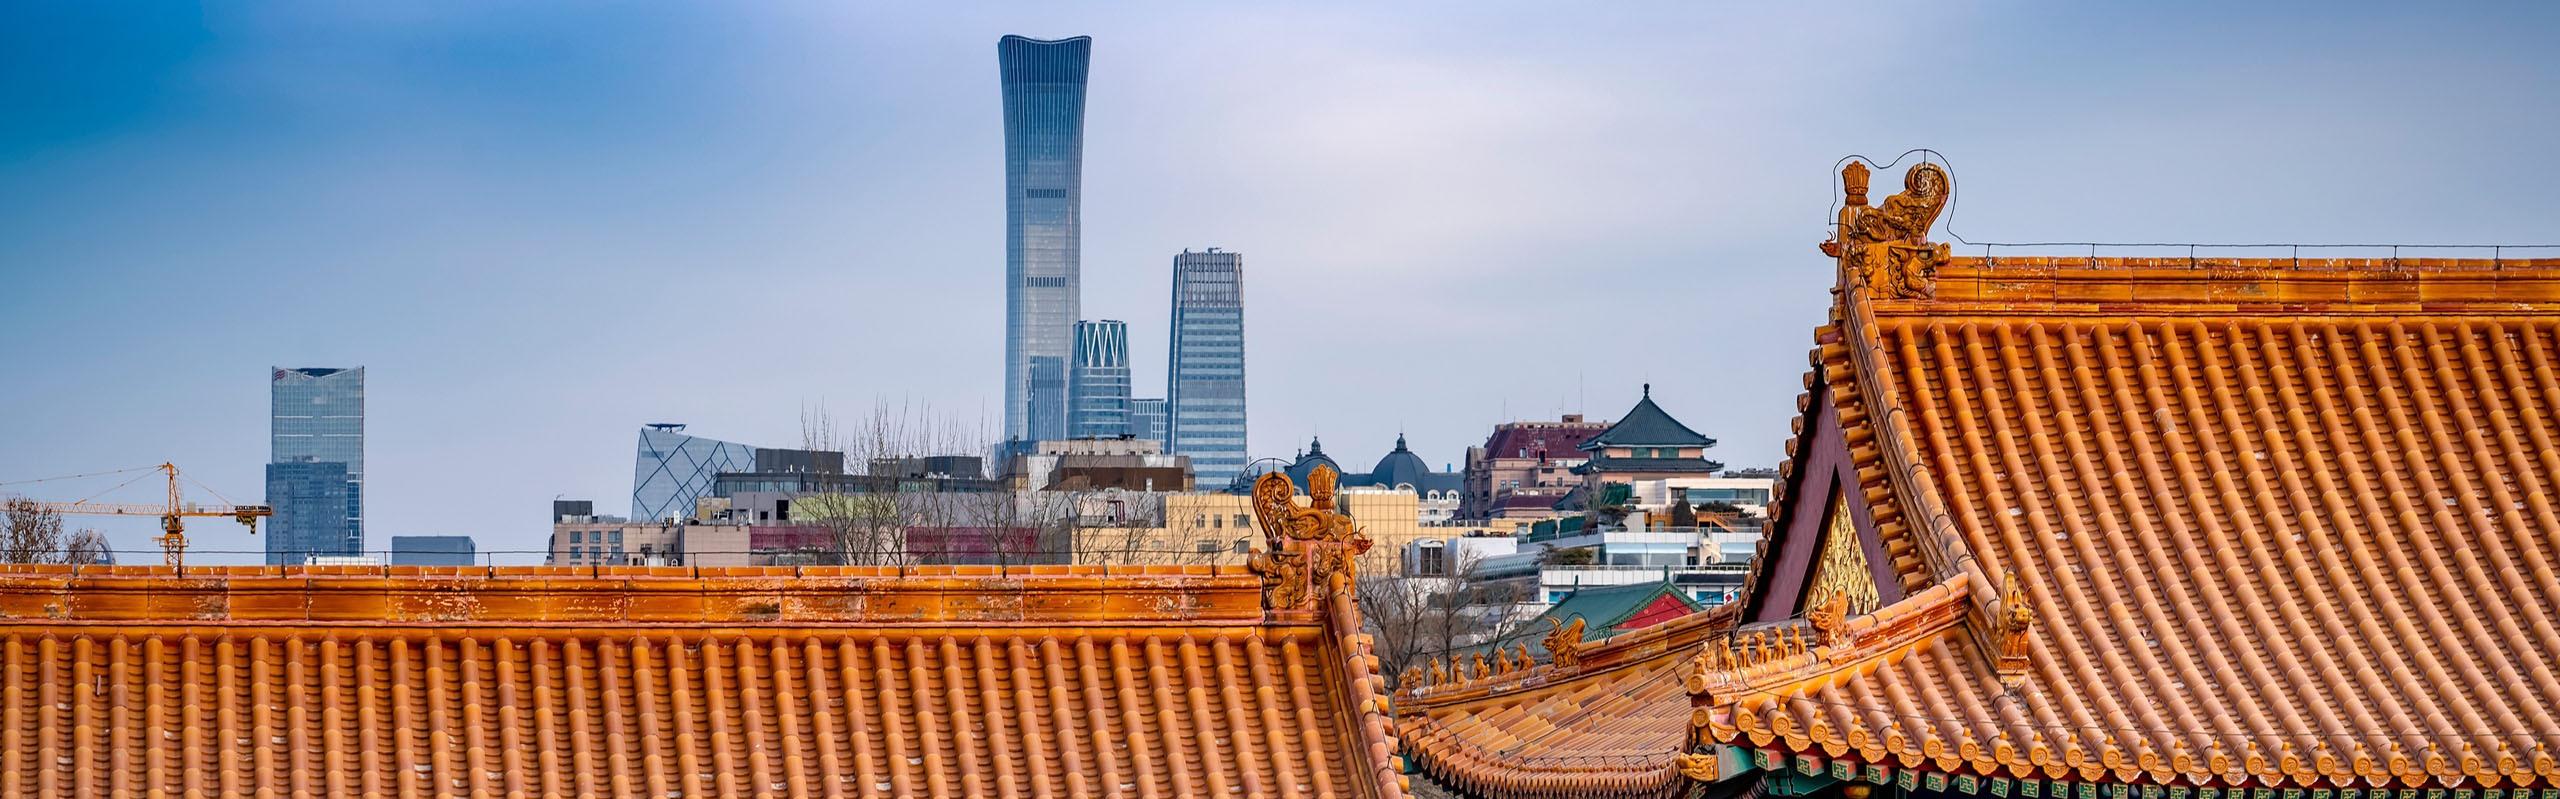 China City Tours